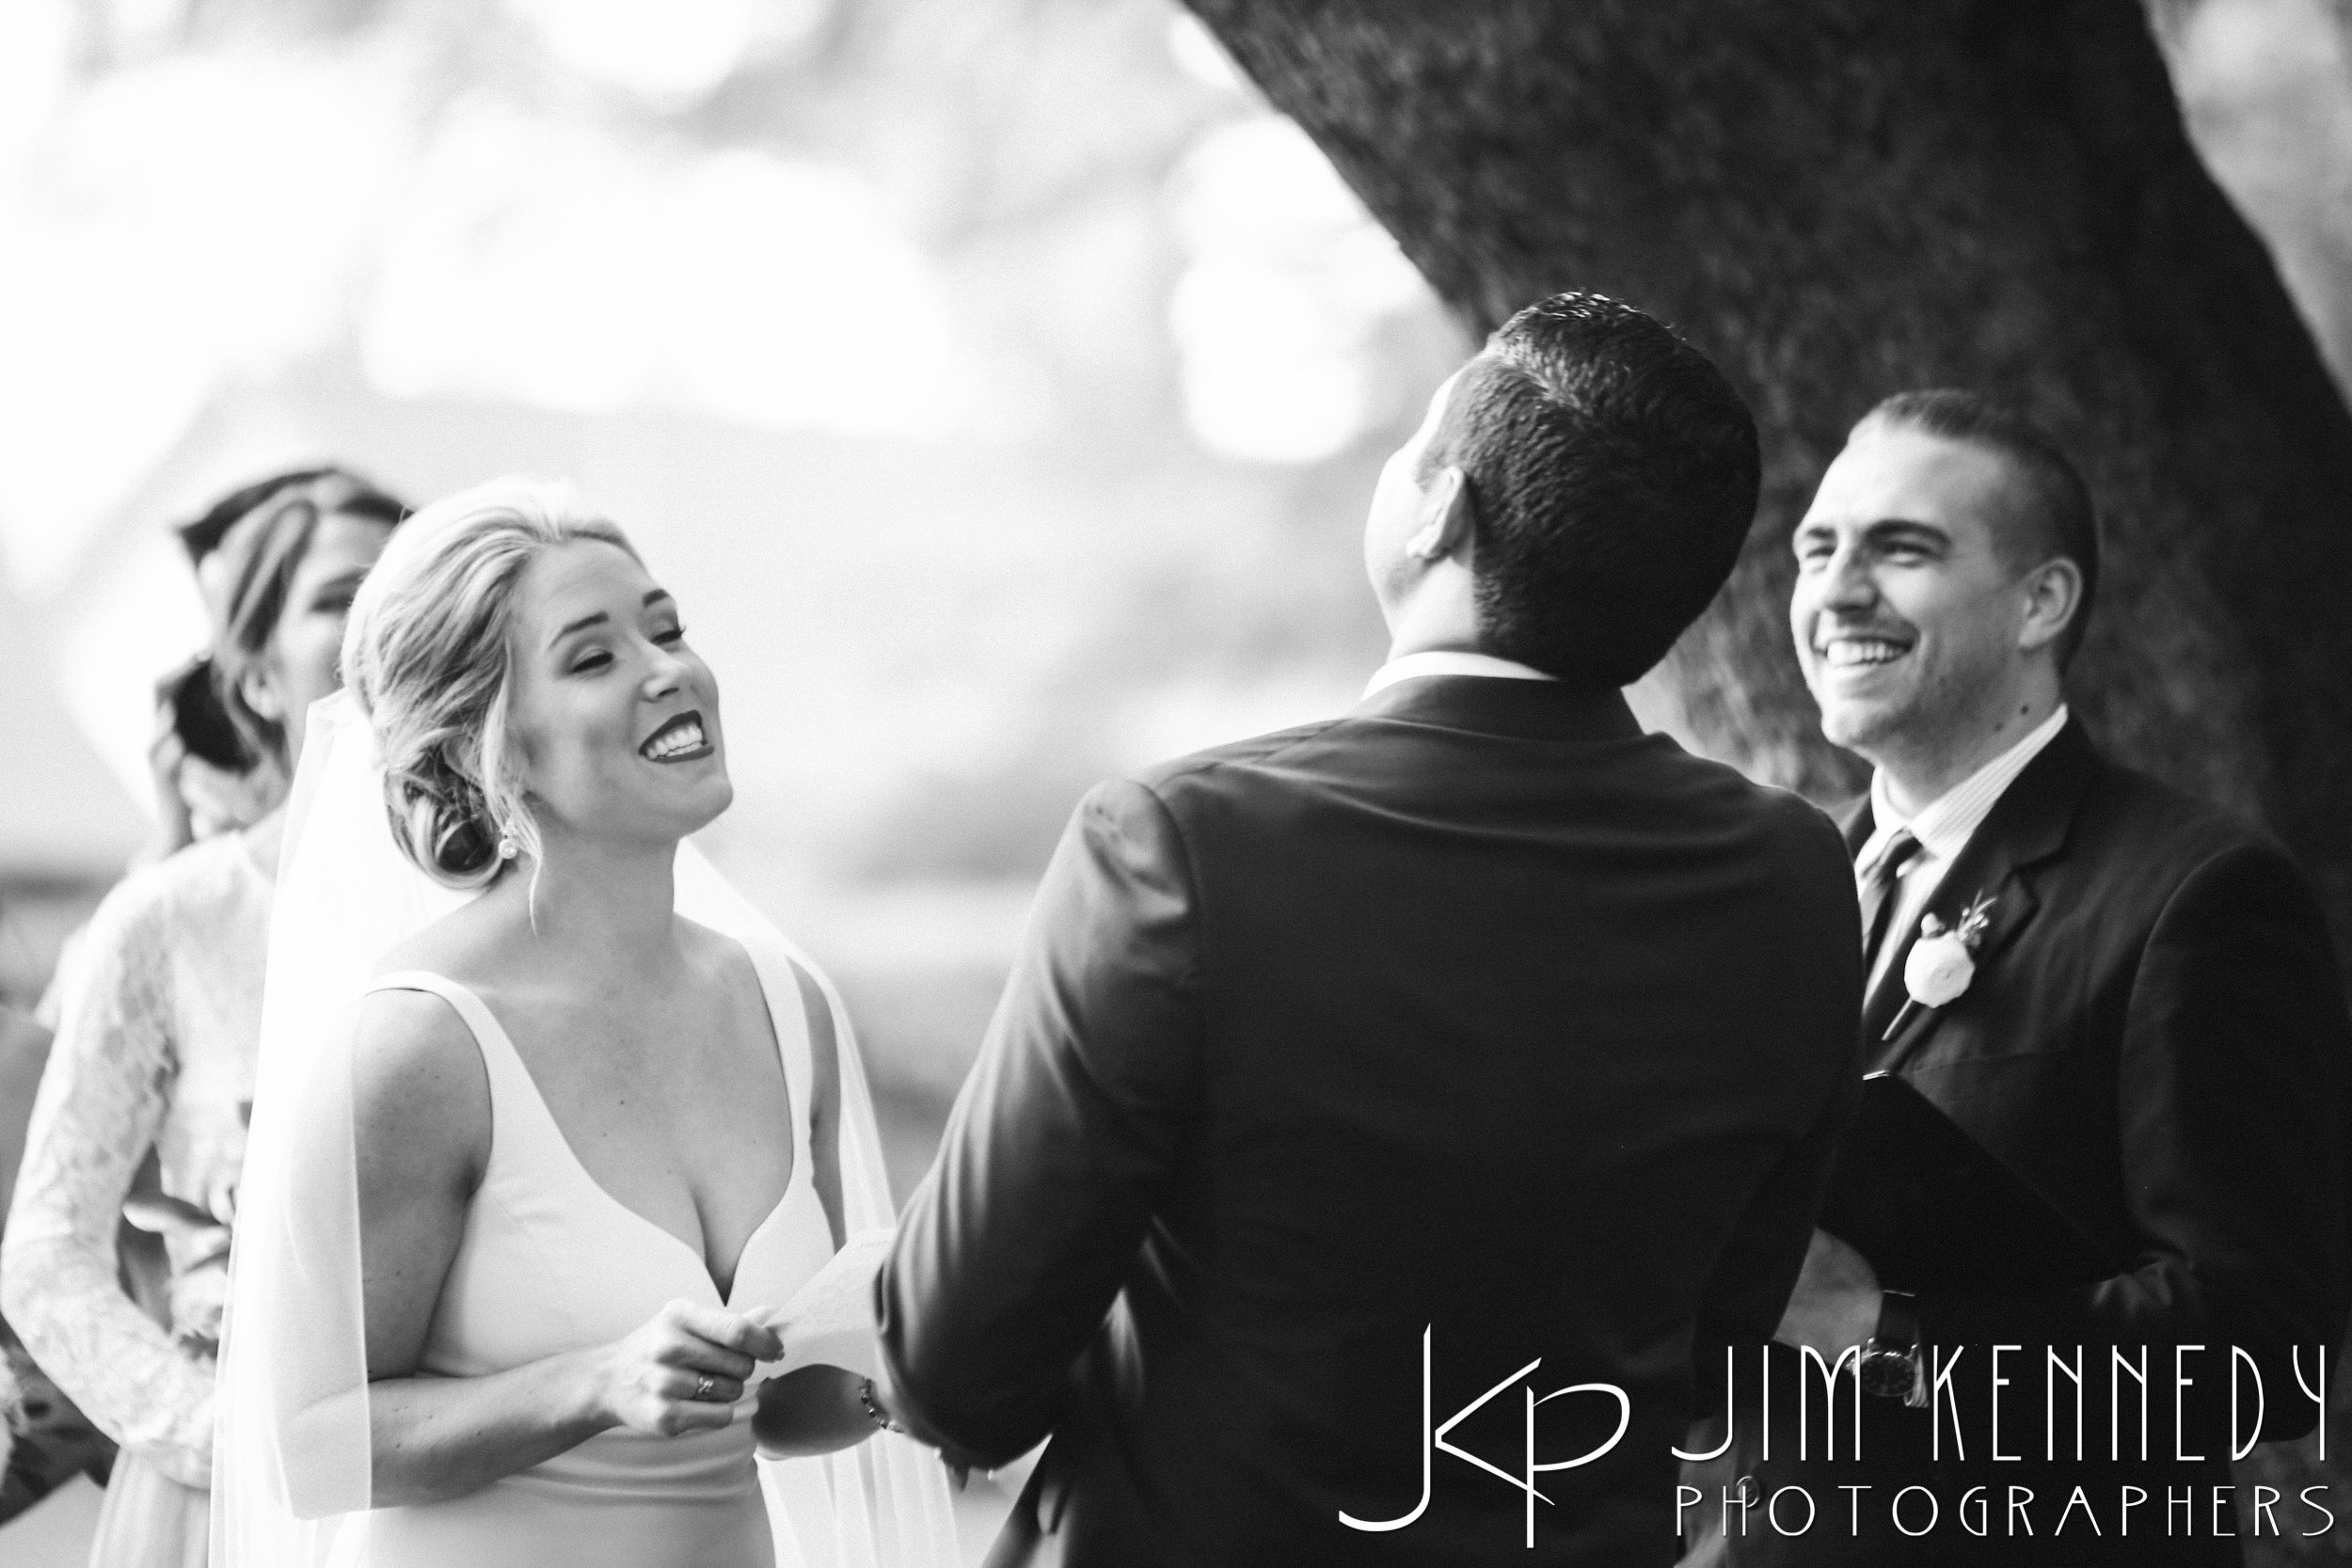 jim_kennedy_photographers_highland_springs_wedding_caitlyn_0108.jpg